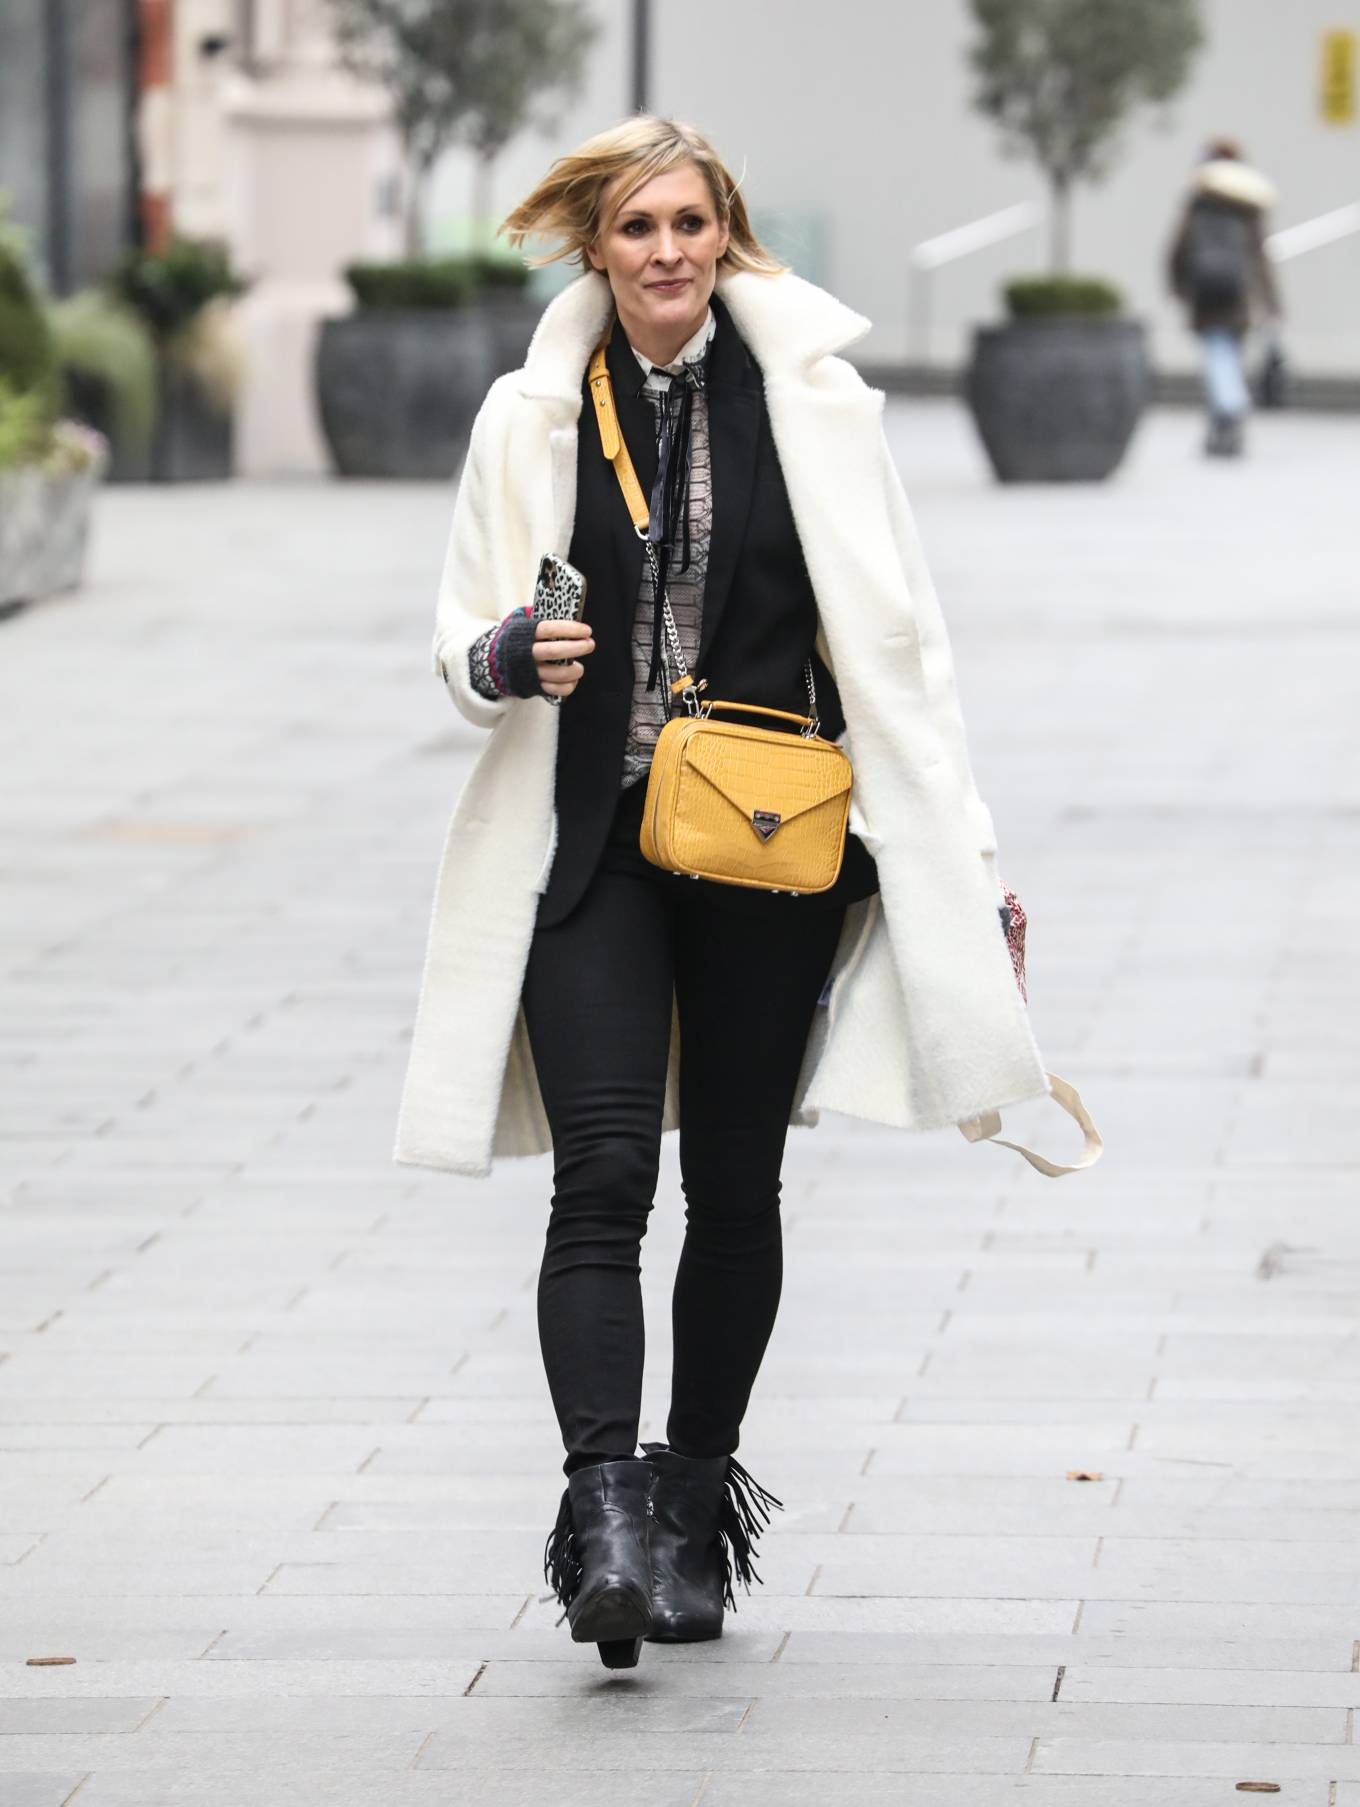 Jenni Falconer - Is seen at Global Radio Studios in London